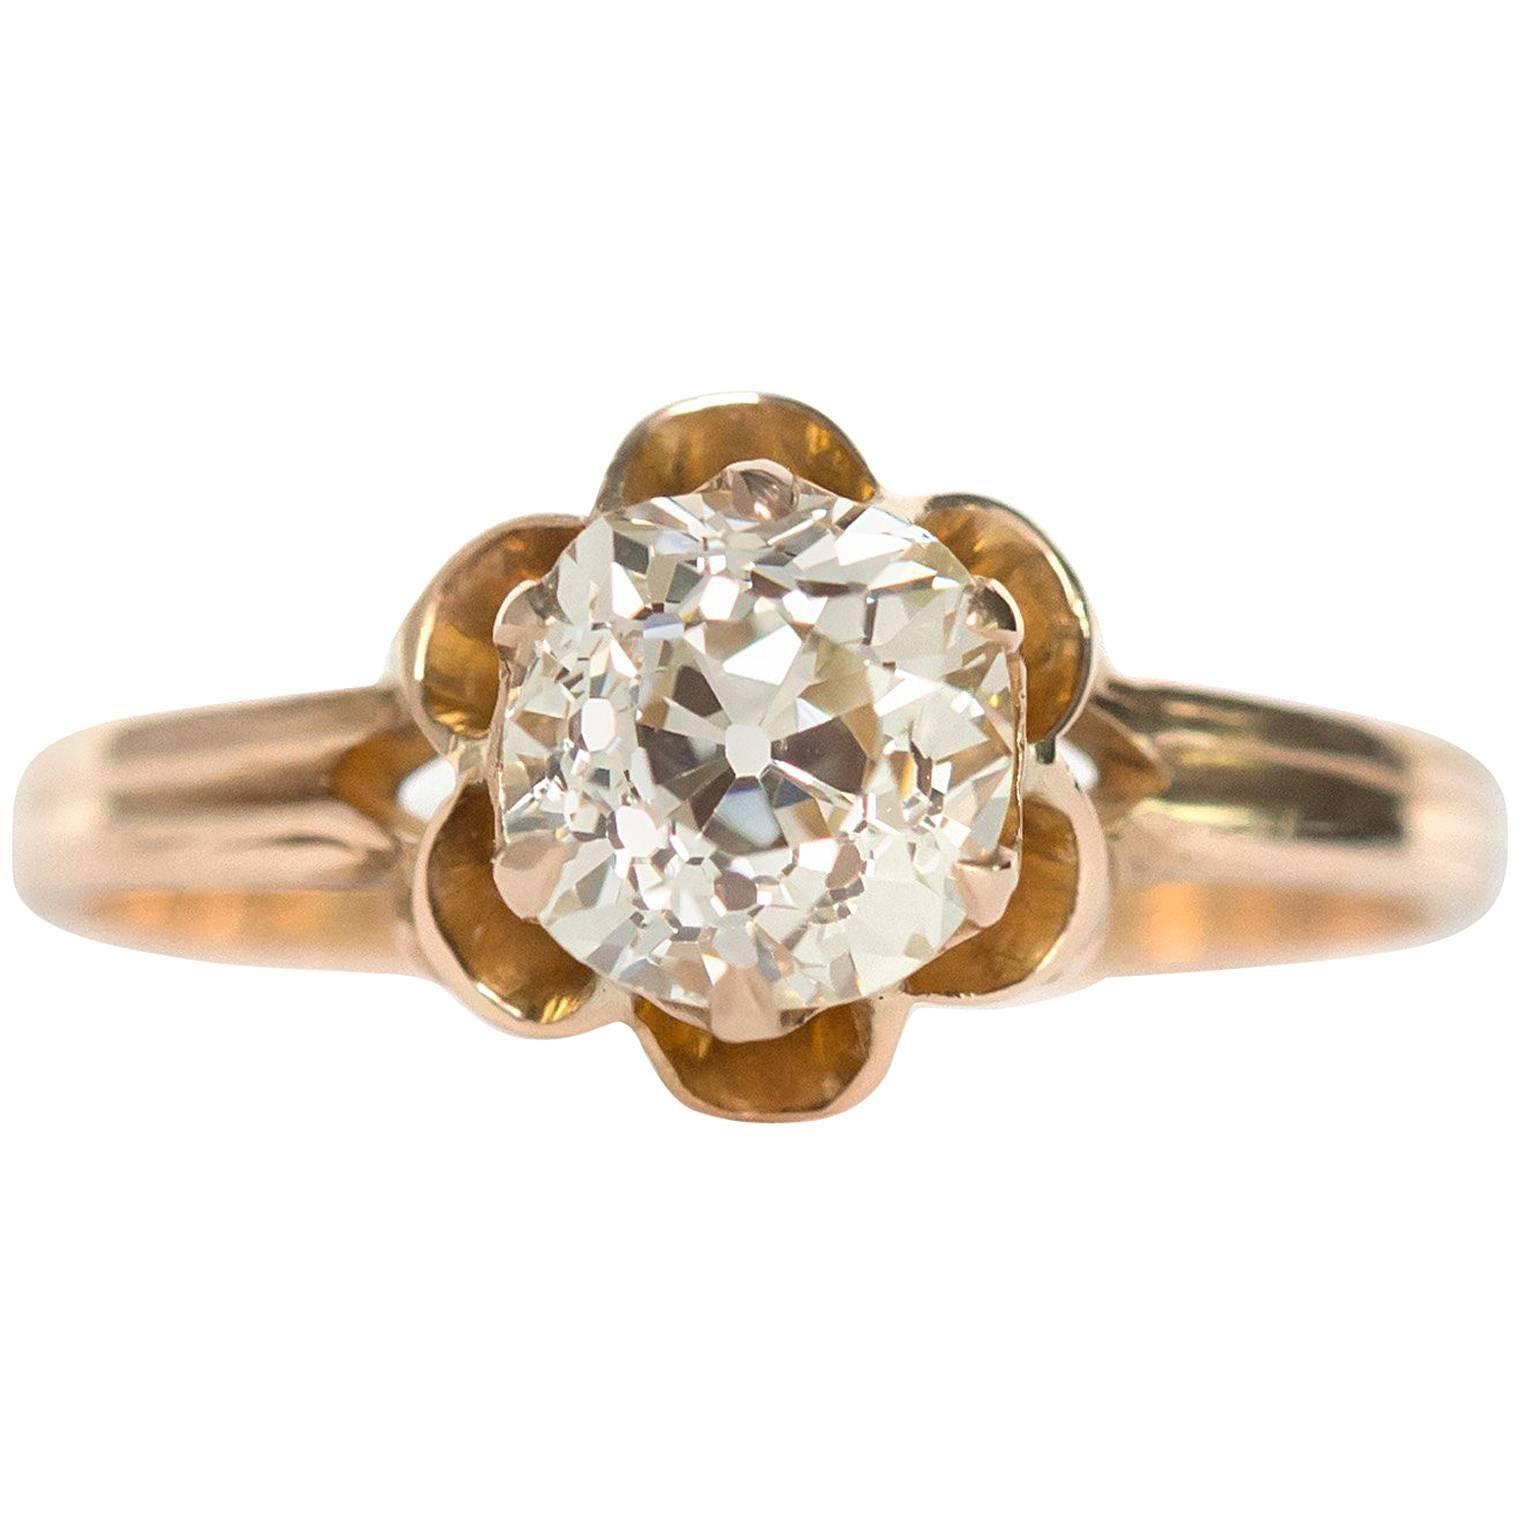 1890s Victorian 1.05 Carat Diamond 14 Karat Yellow Gold Engagement Ring